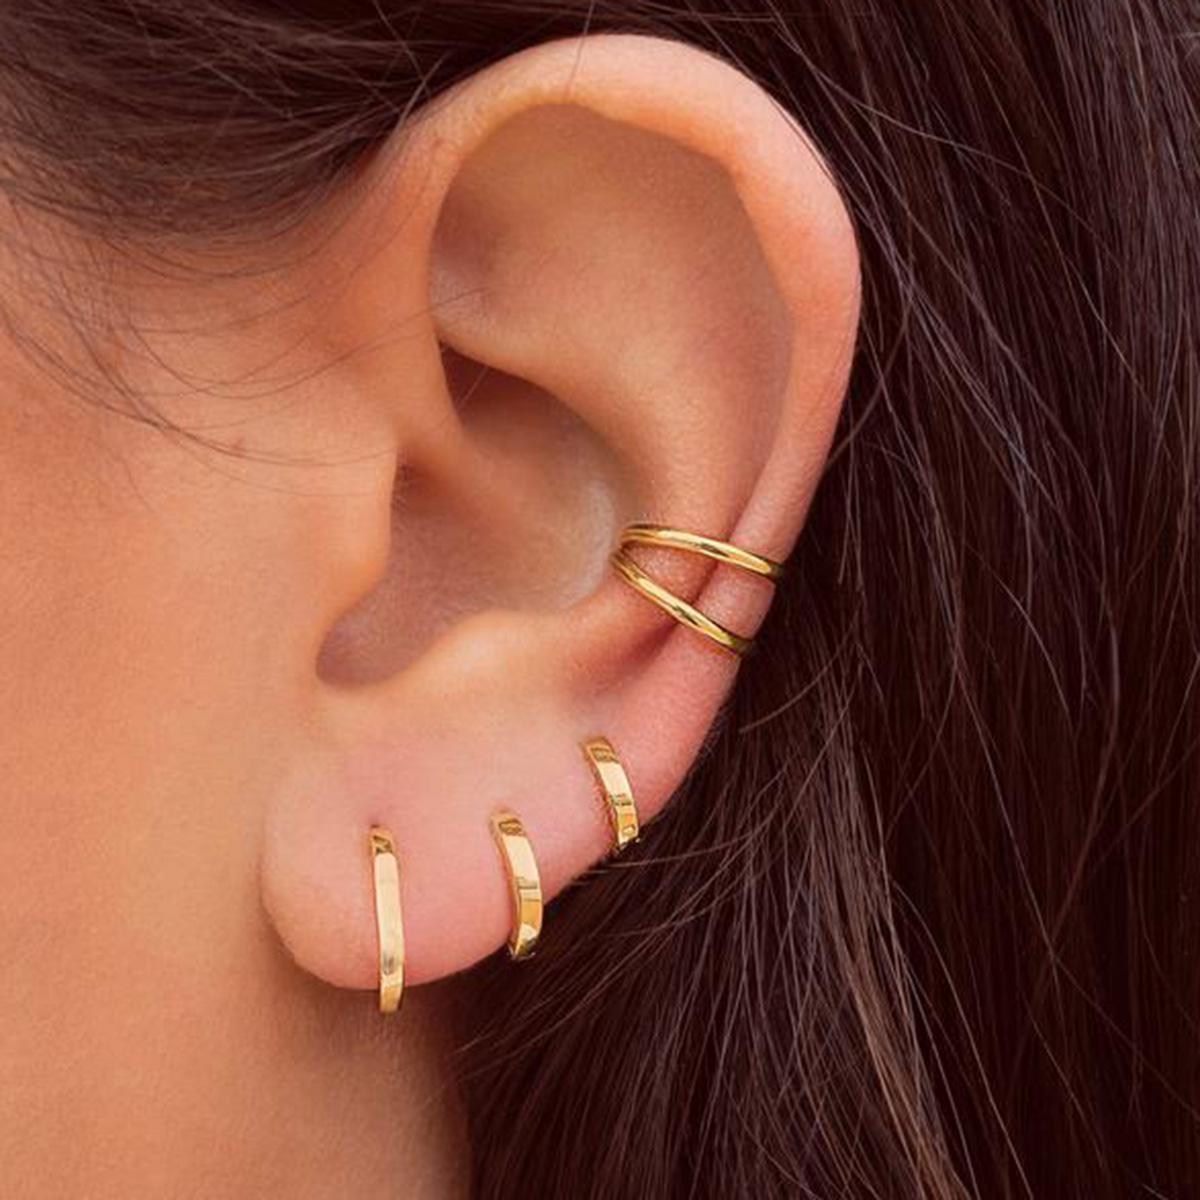 4pcs Minimalist Earring